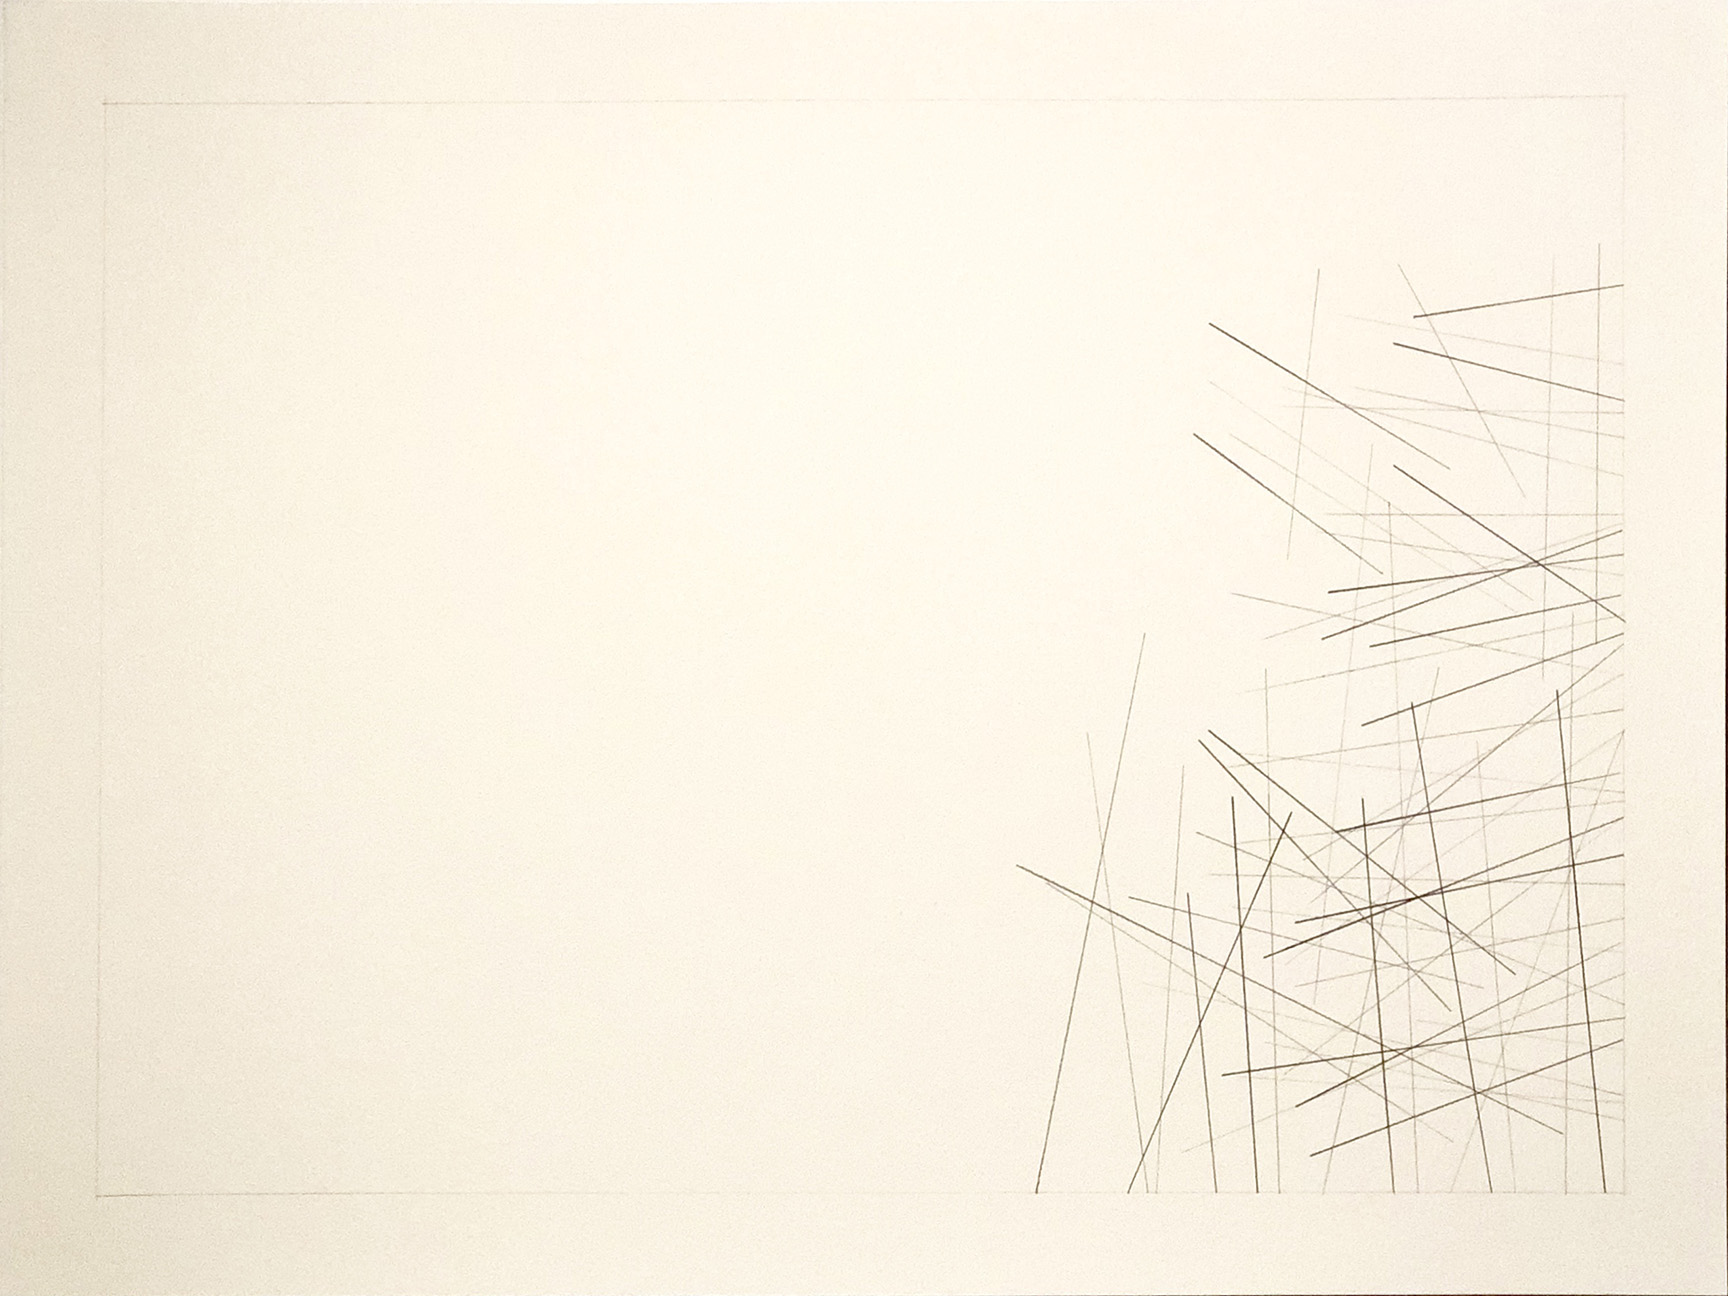 Parowan, Utah 37.8455, -112.8253,  2018  Graphite on paper  18H x 24W inches unframed  21.75H x 27.75W inches framed